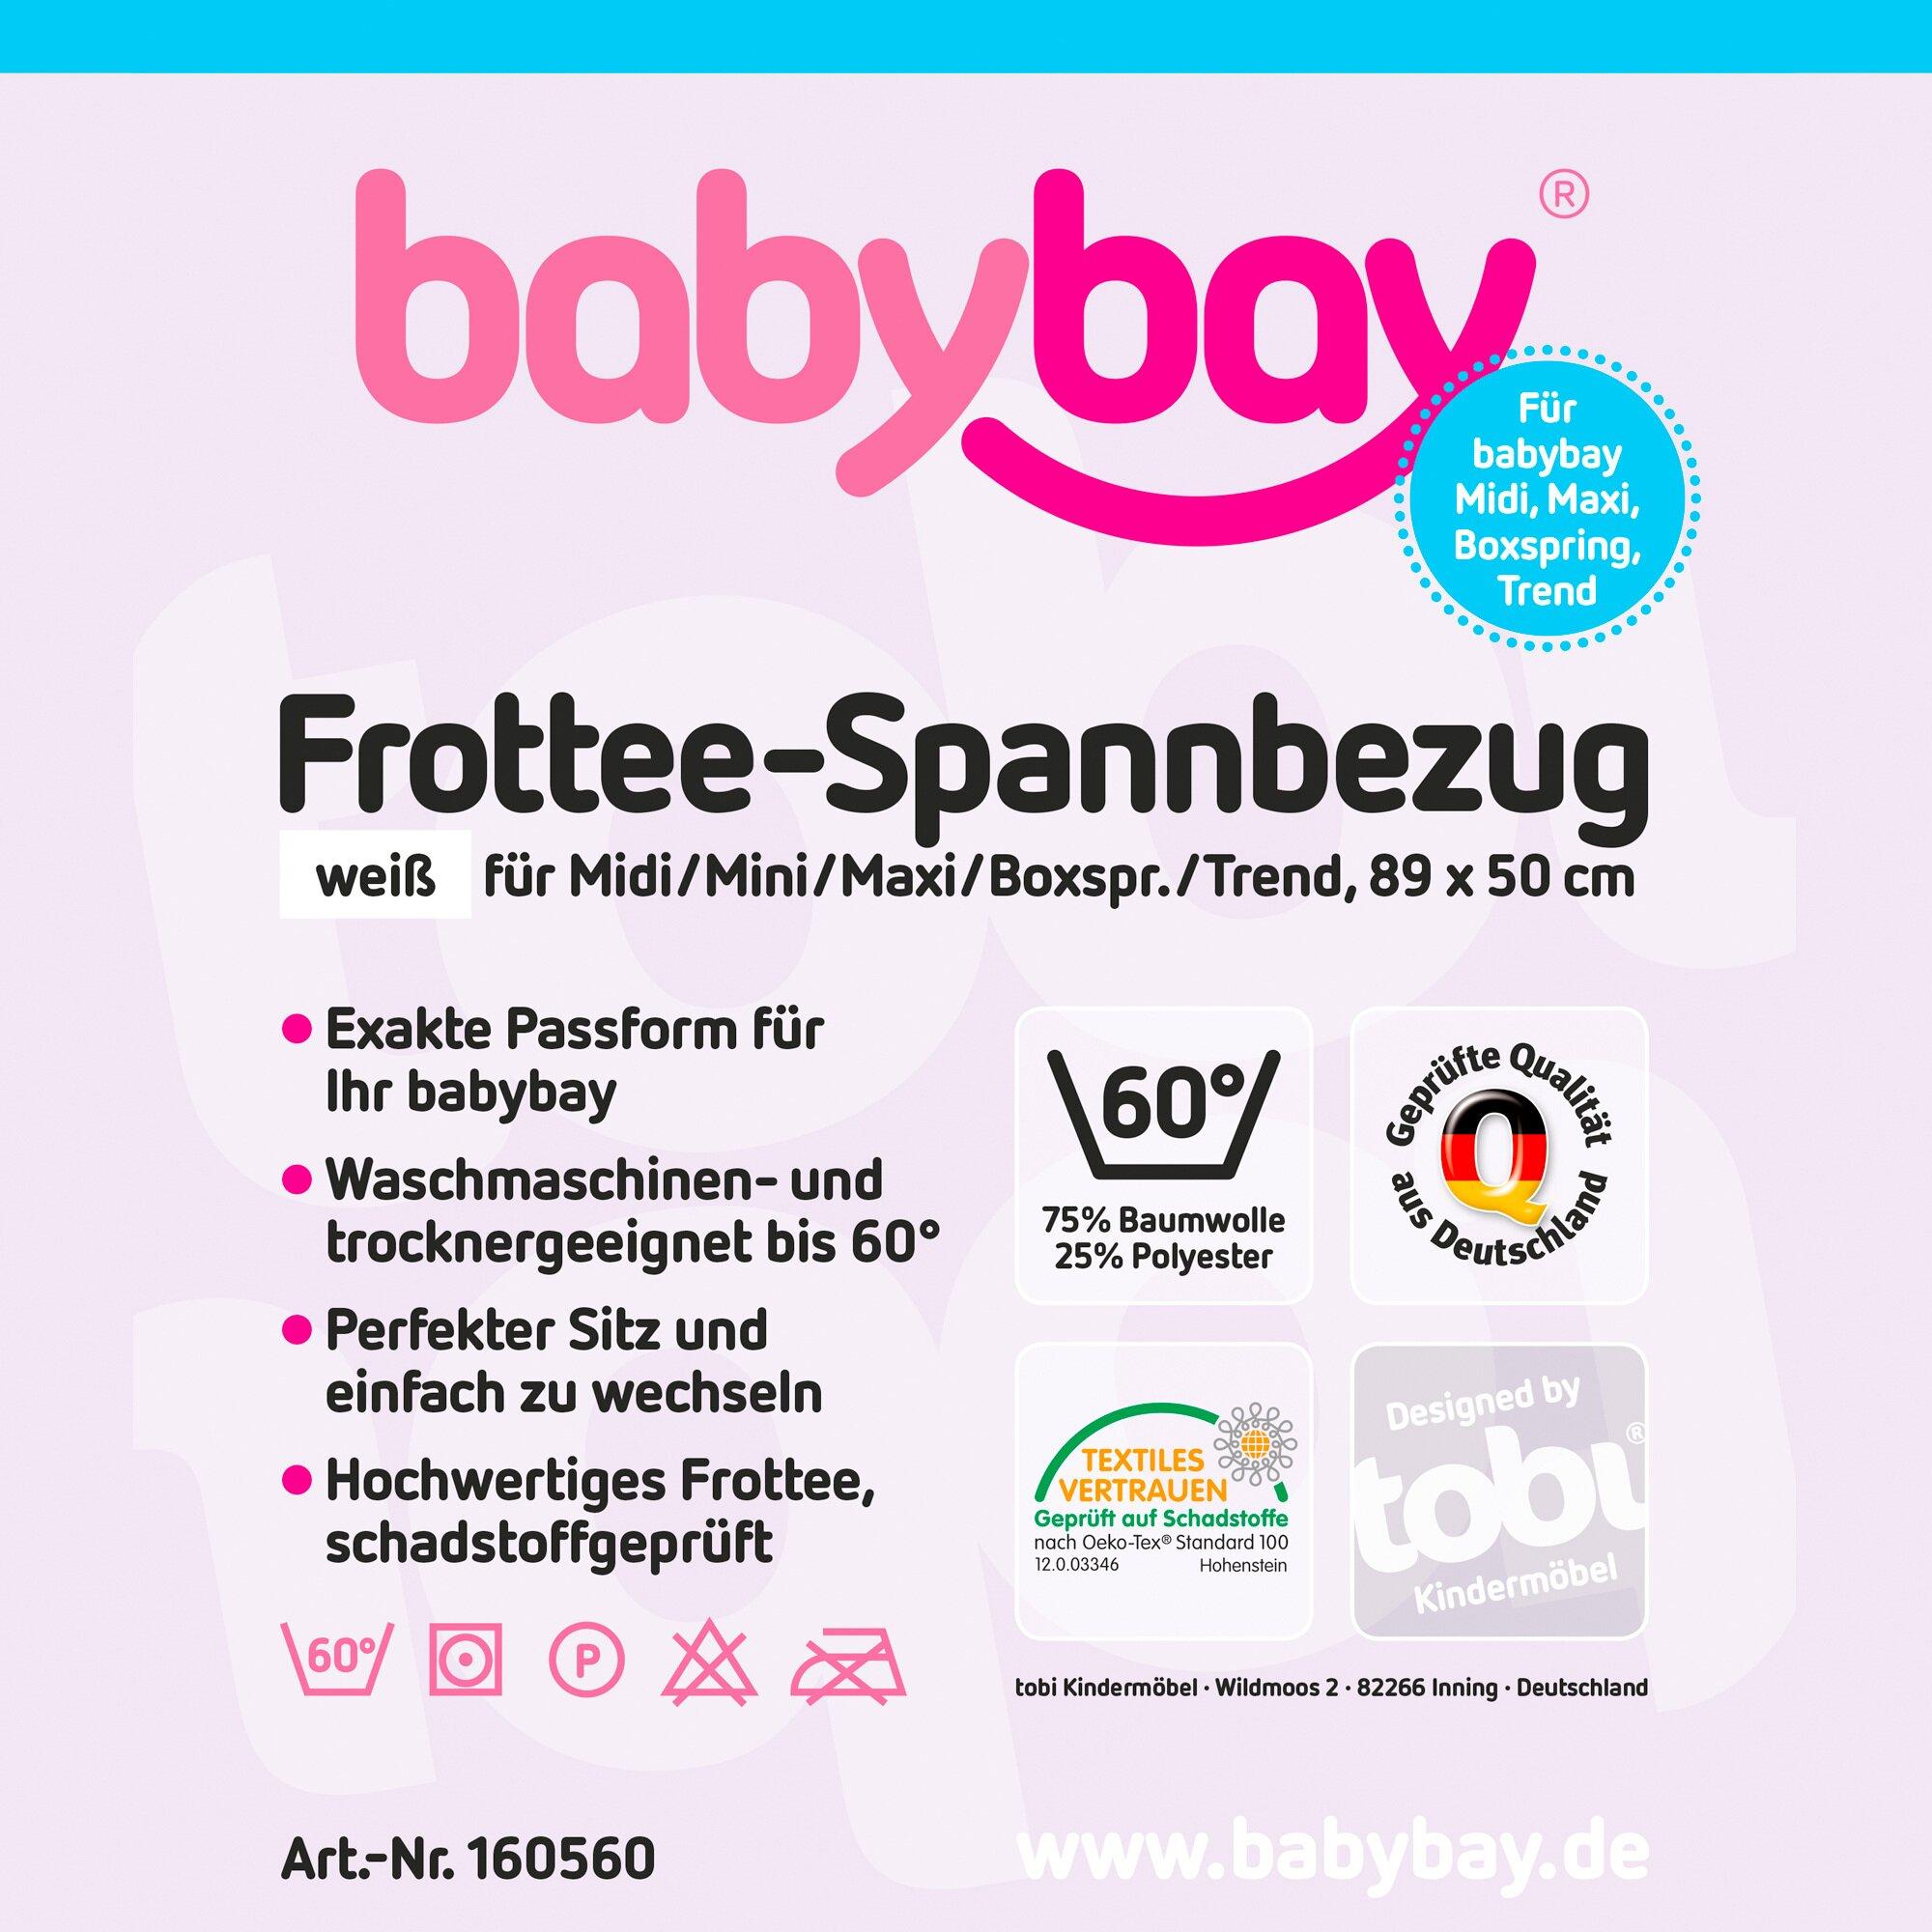 Babybay® Frottee-Spannbetttuch Maxi 89x50 cm weiss